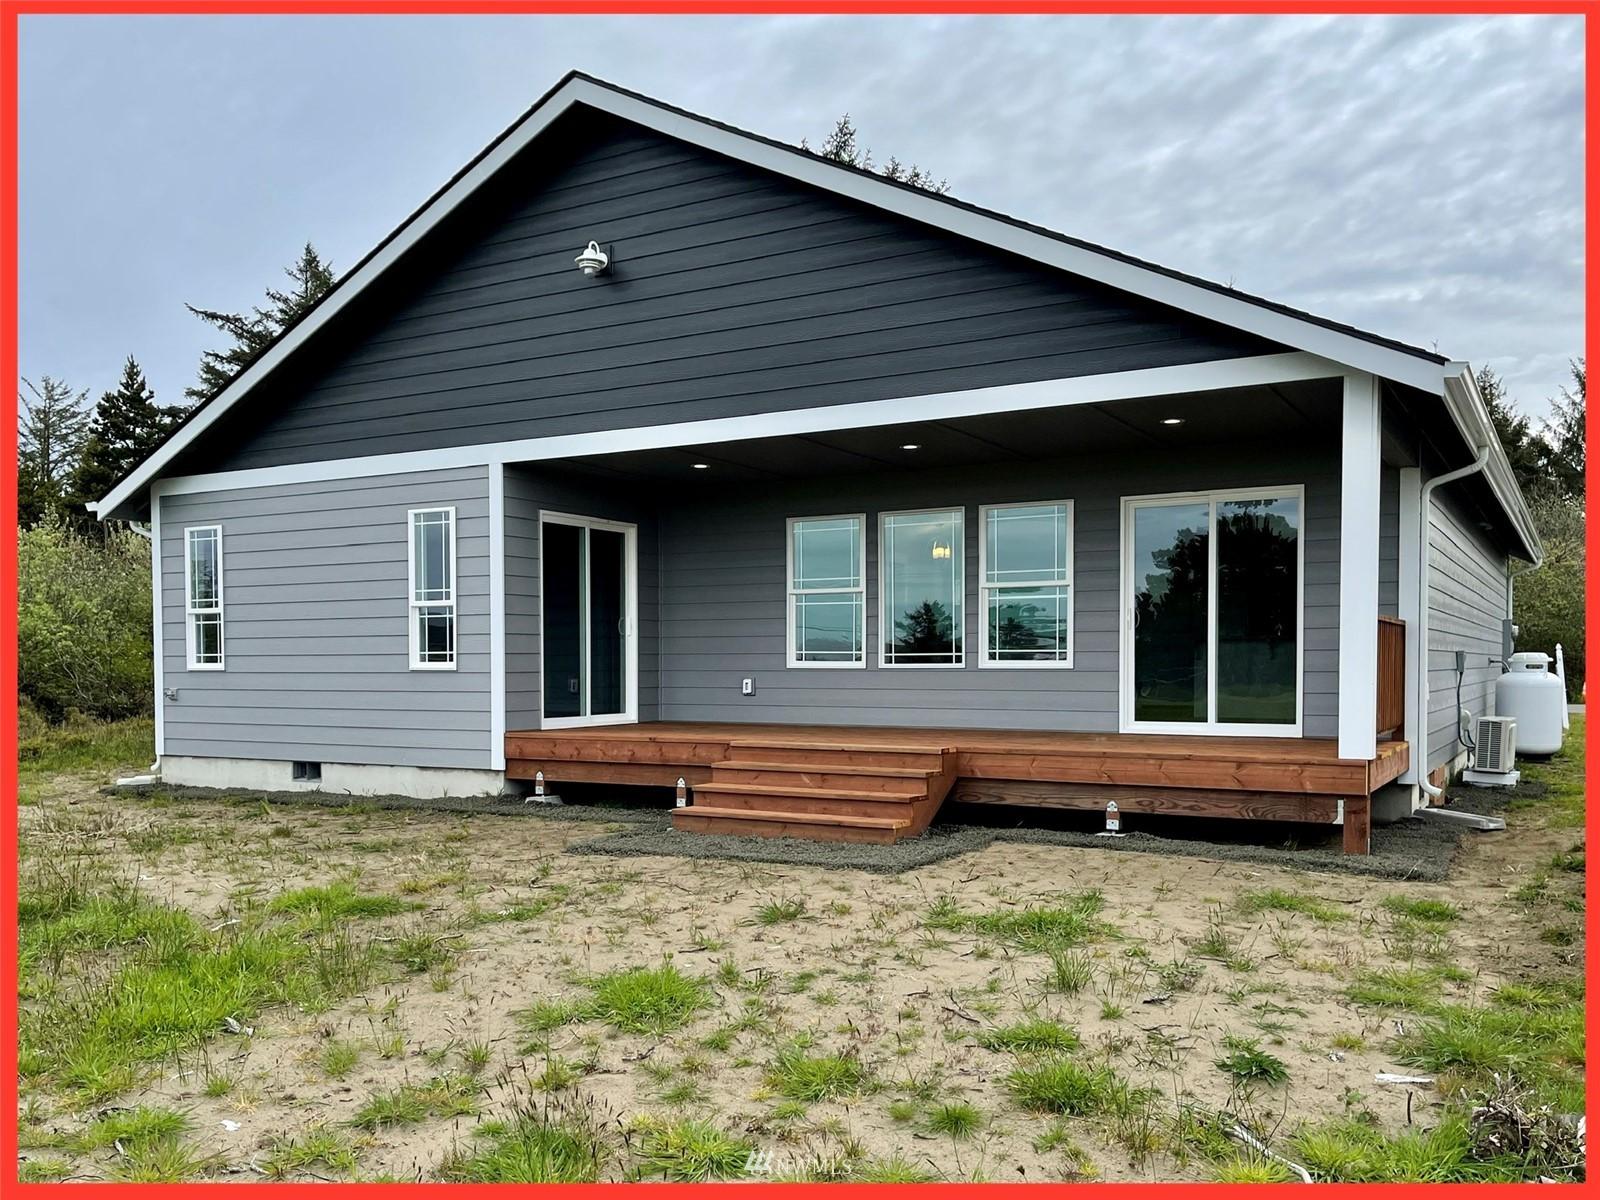 Photo 8 571 Puffin Ave NE Ocean Shores WA 98569